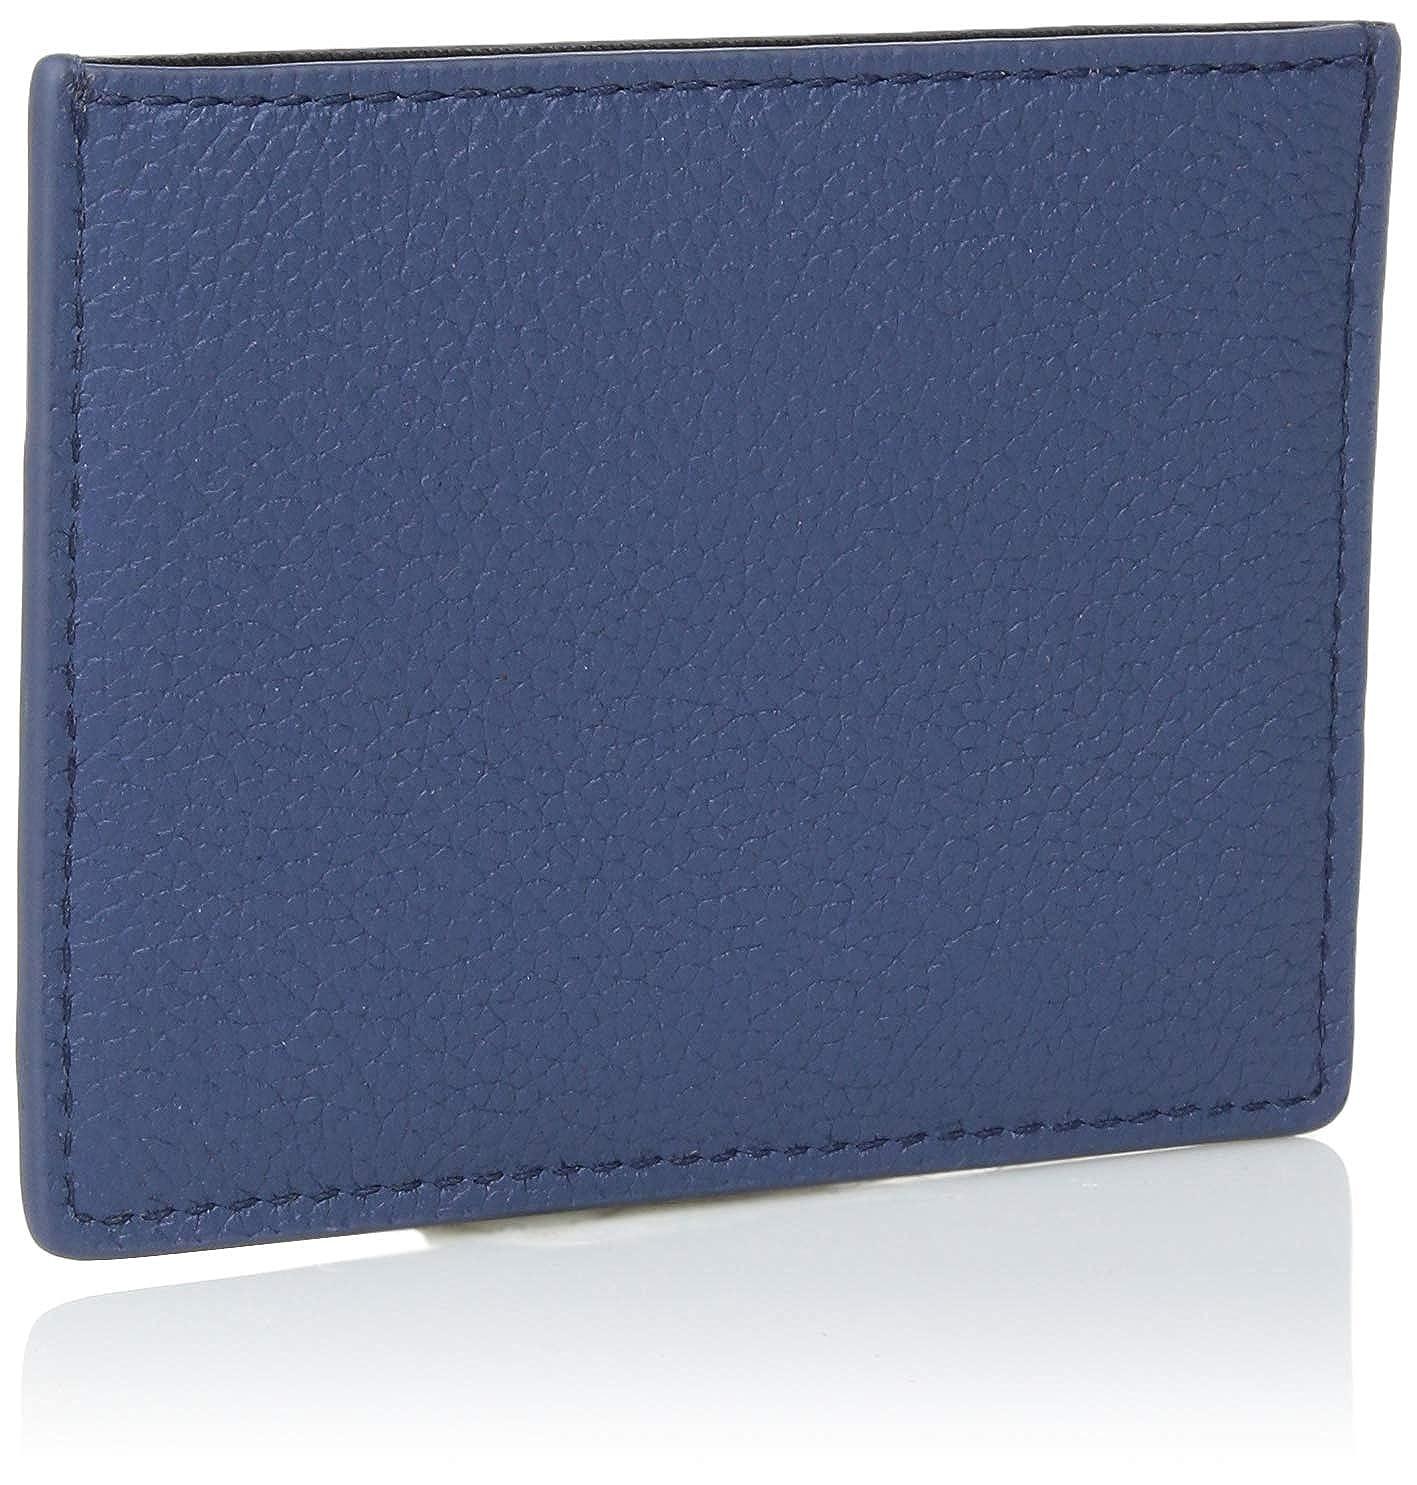 Amazon.com  Emporio Armani Classic Credit Card Holder, Baby Blue  Clothing a9ac7a2779